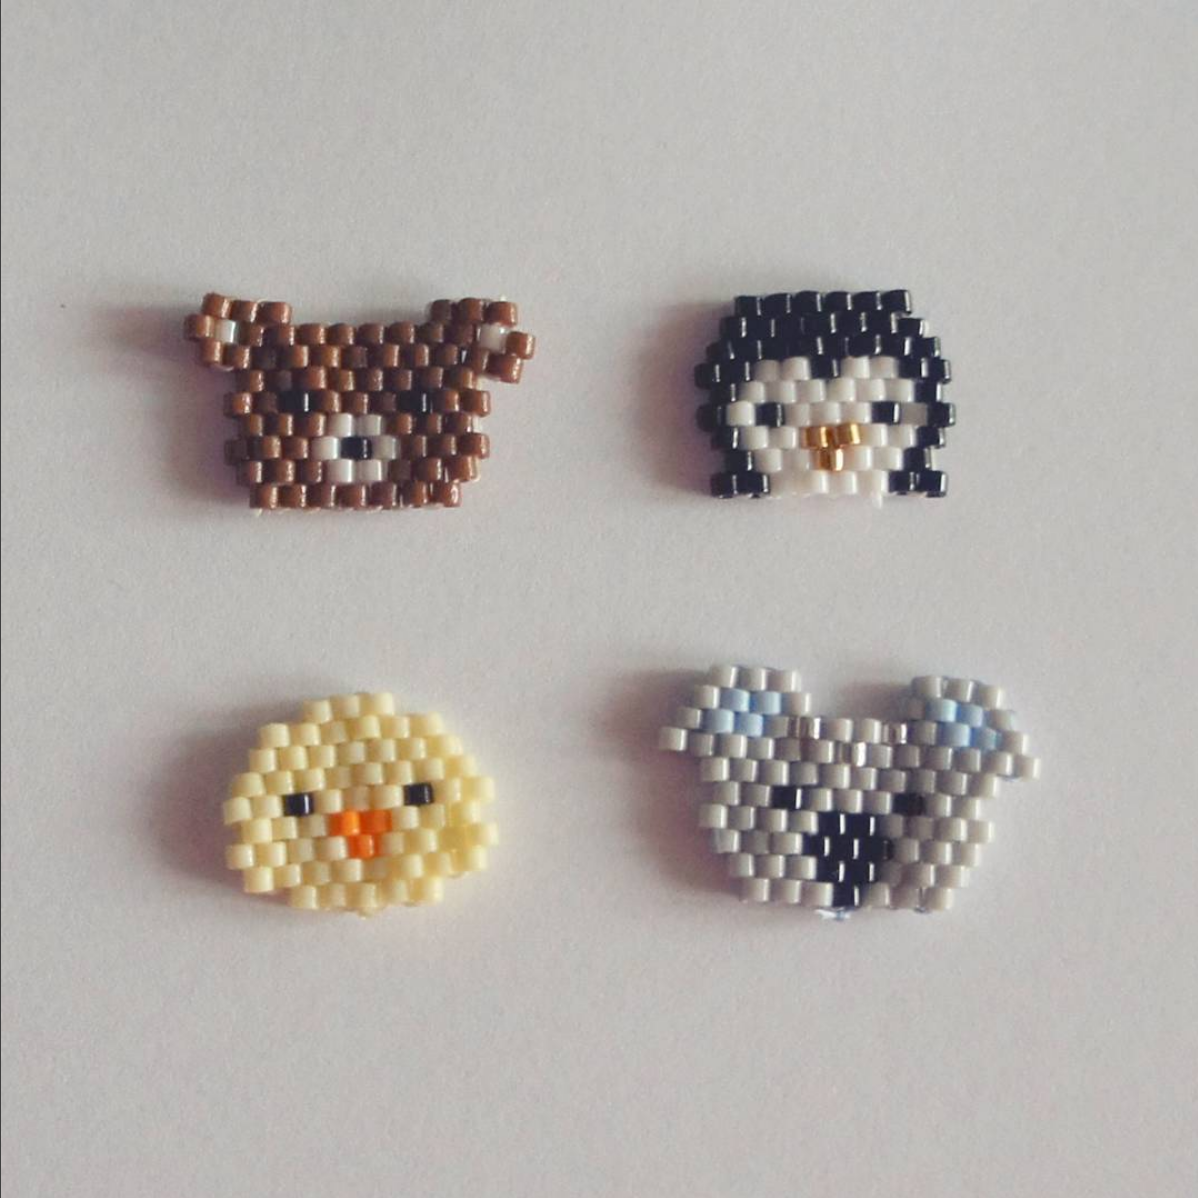 Mini animaux – Partie 2